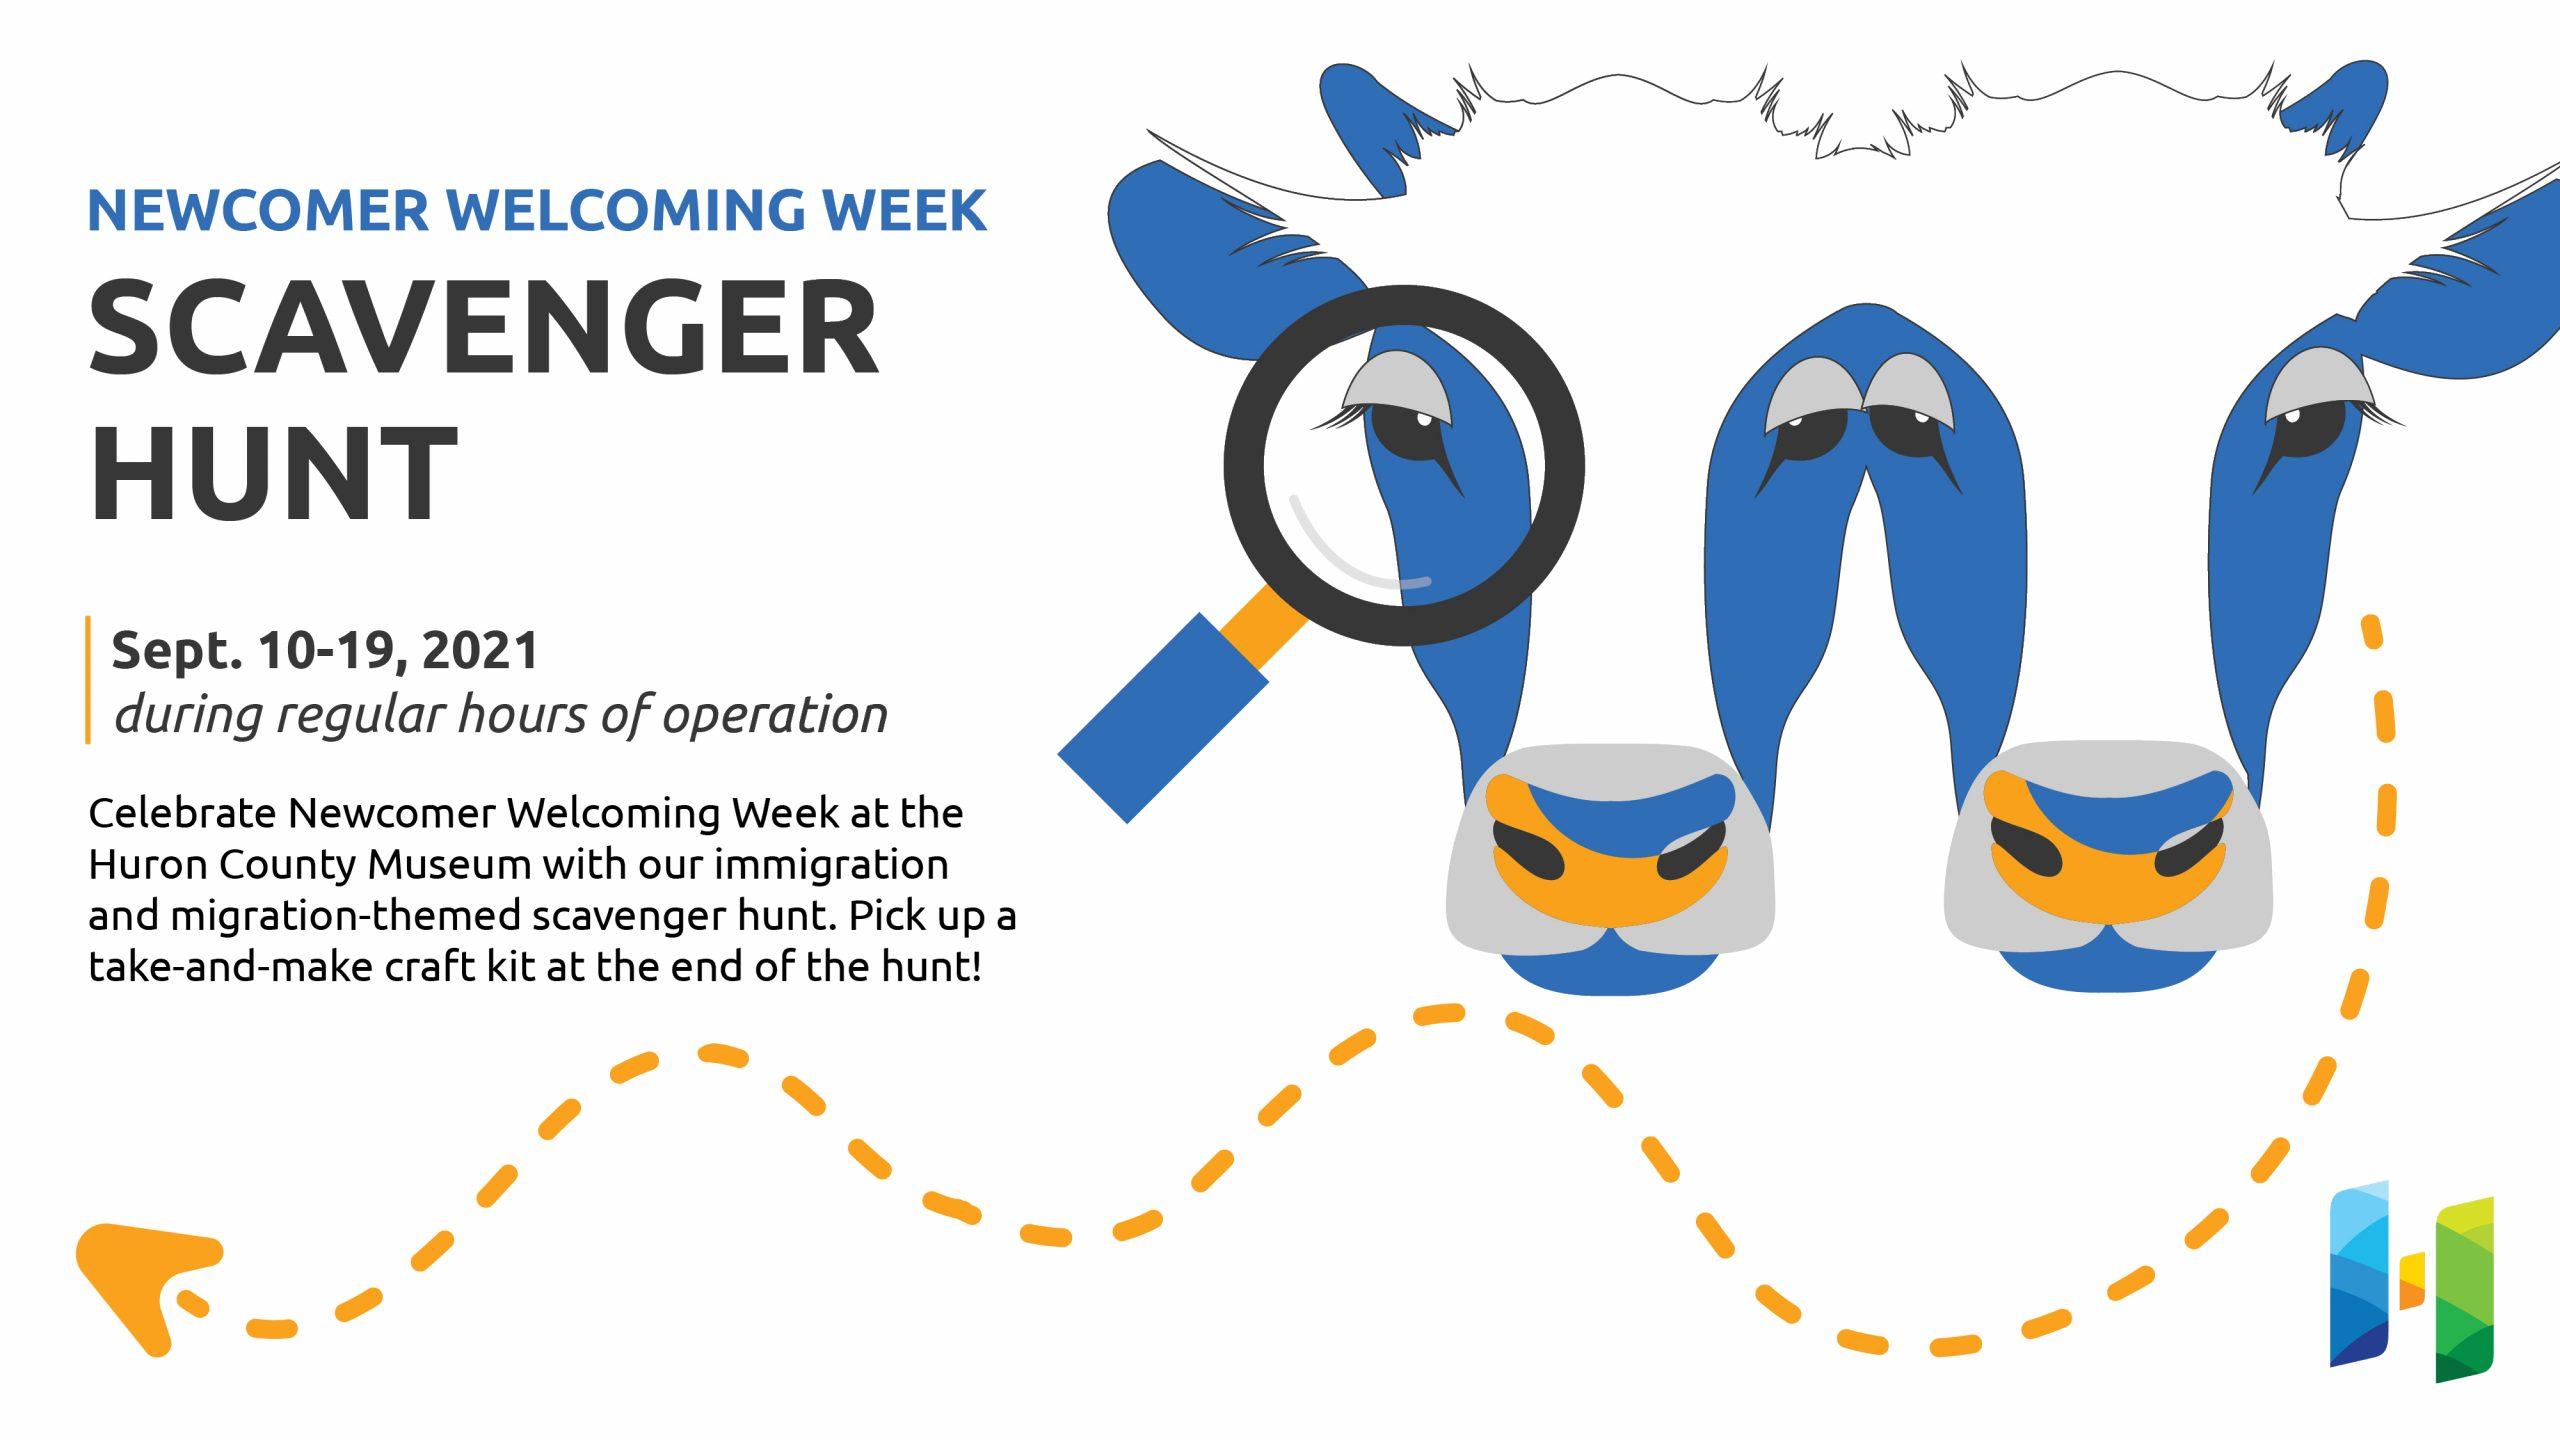 Newcomer Welcoming Week Scavenger Hunt